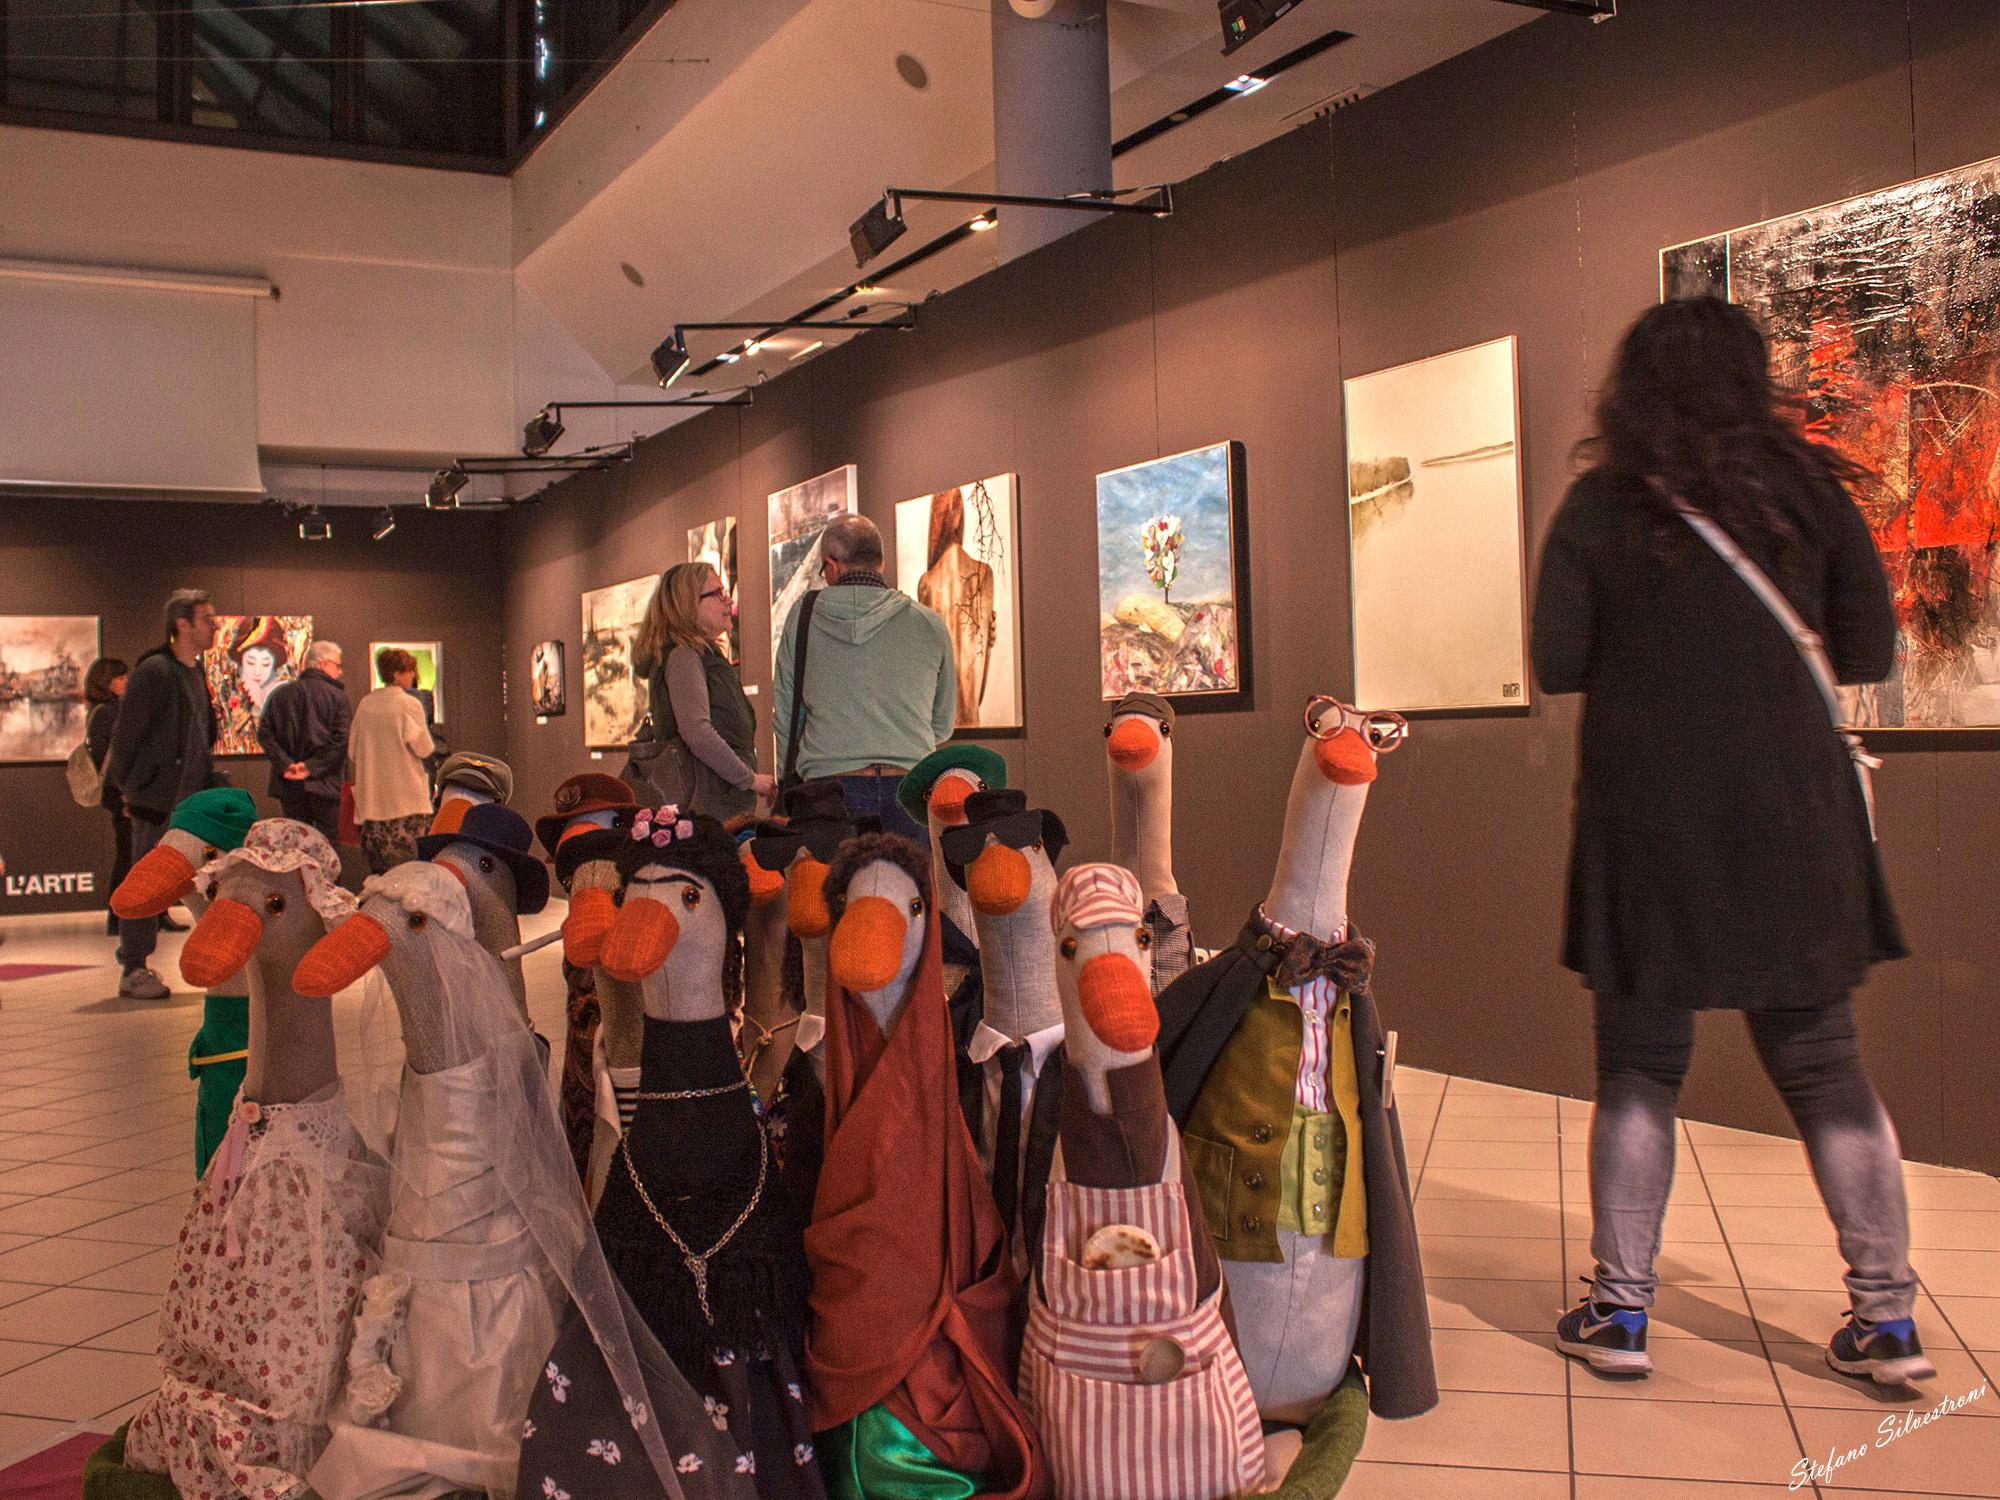 A visit to Vernice Art Fair...